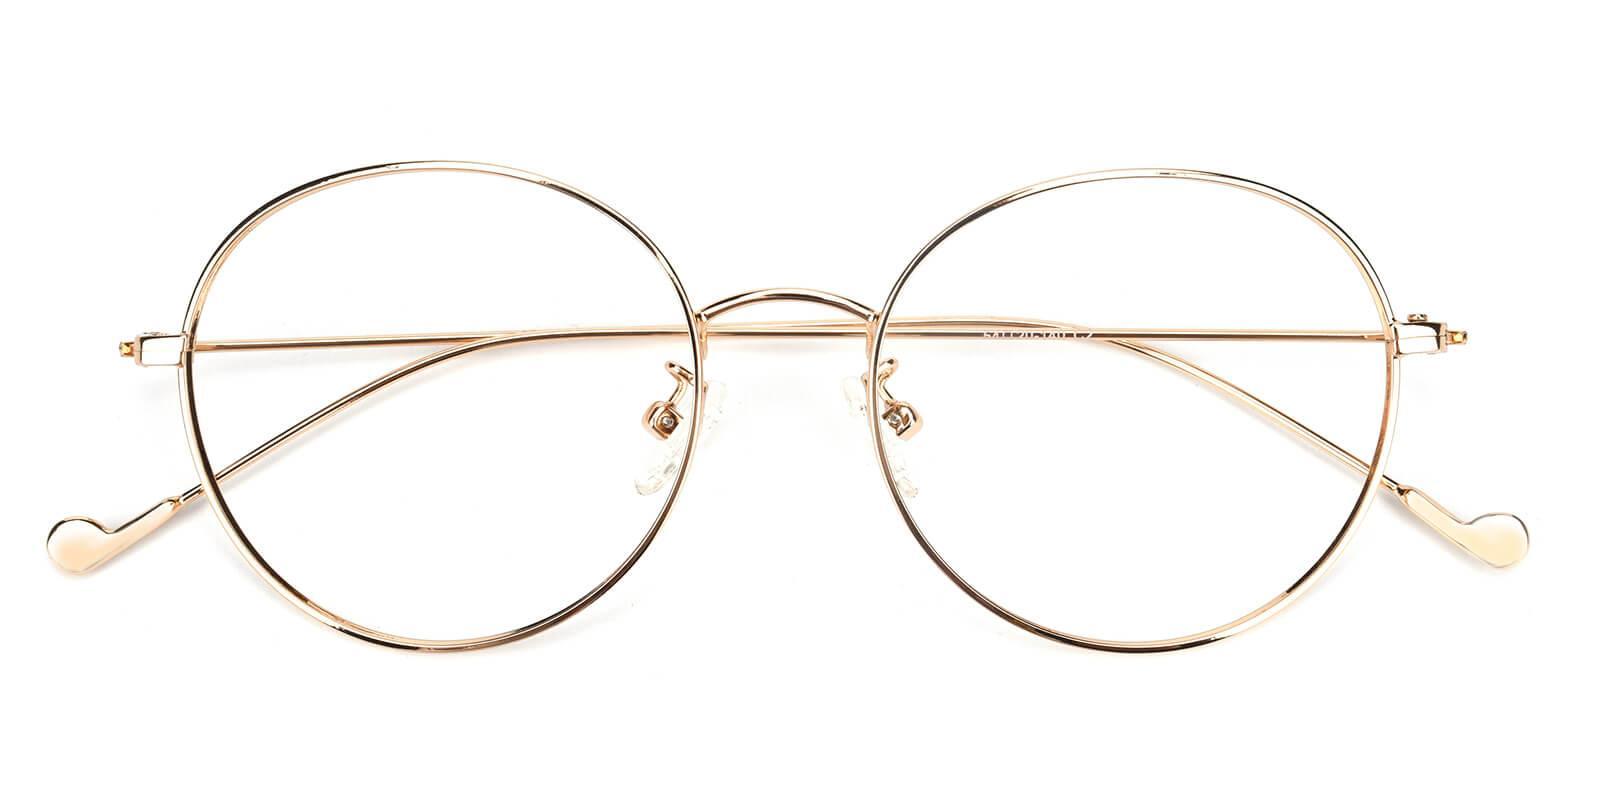 Jessy-Gold-Round-Metal-Eyeglasses-detail